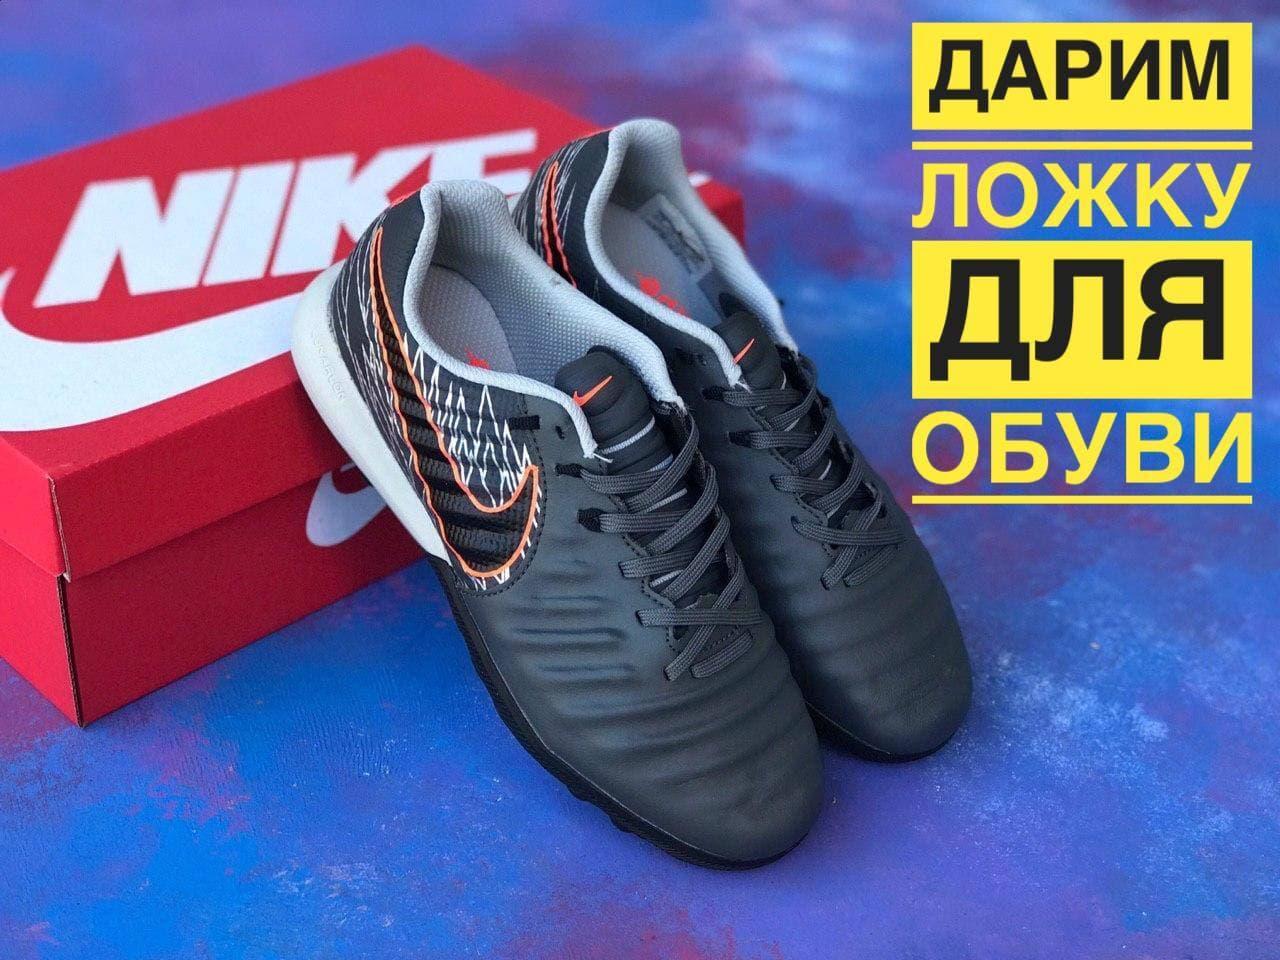 Стоноги Nike Tiempo Victory Pack многошиповки найк темпо вікторі пак тиемпо бампы лигера